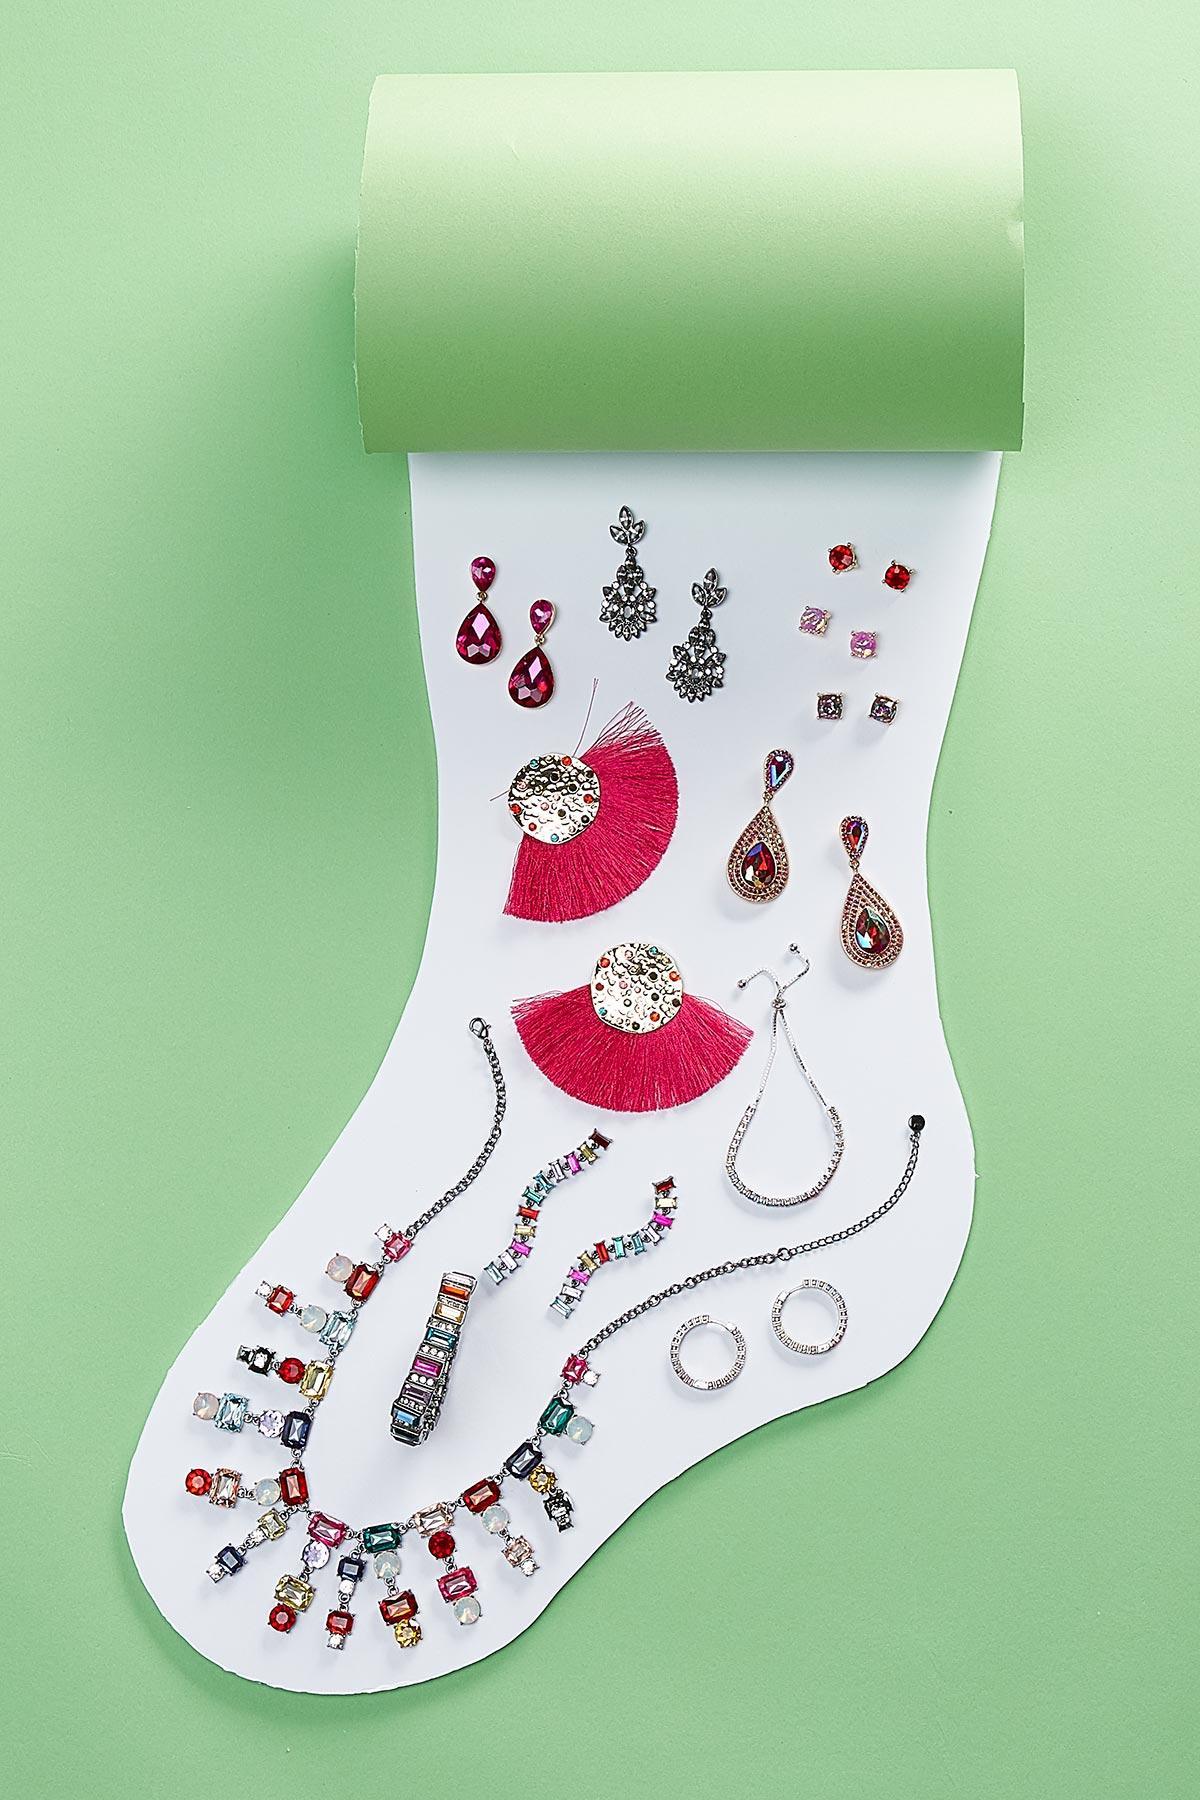 Dangling Jeweled Earrings